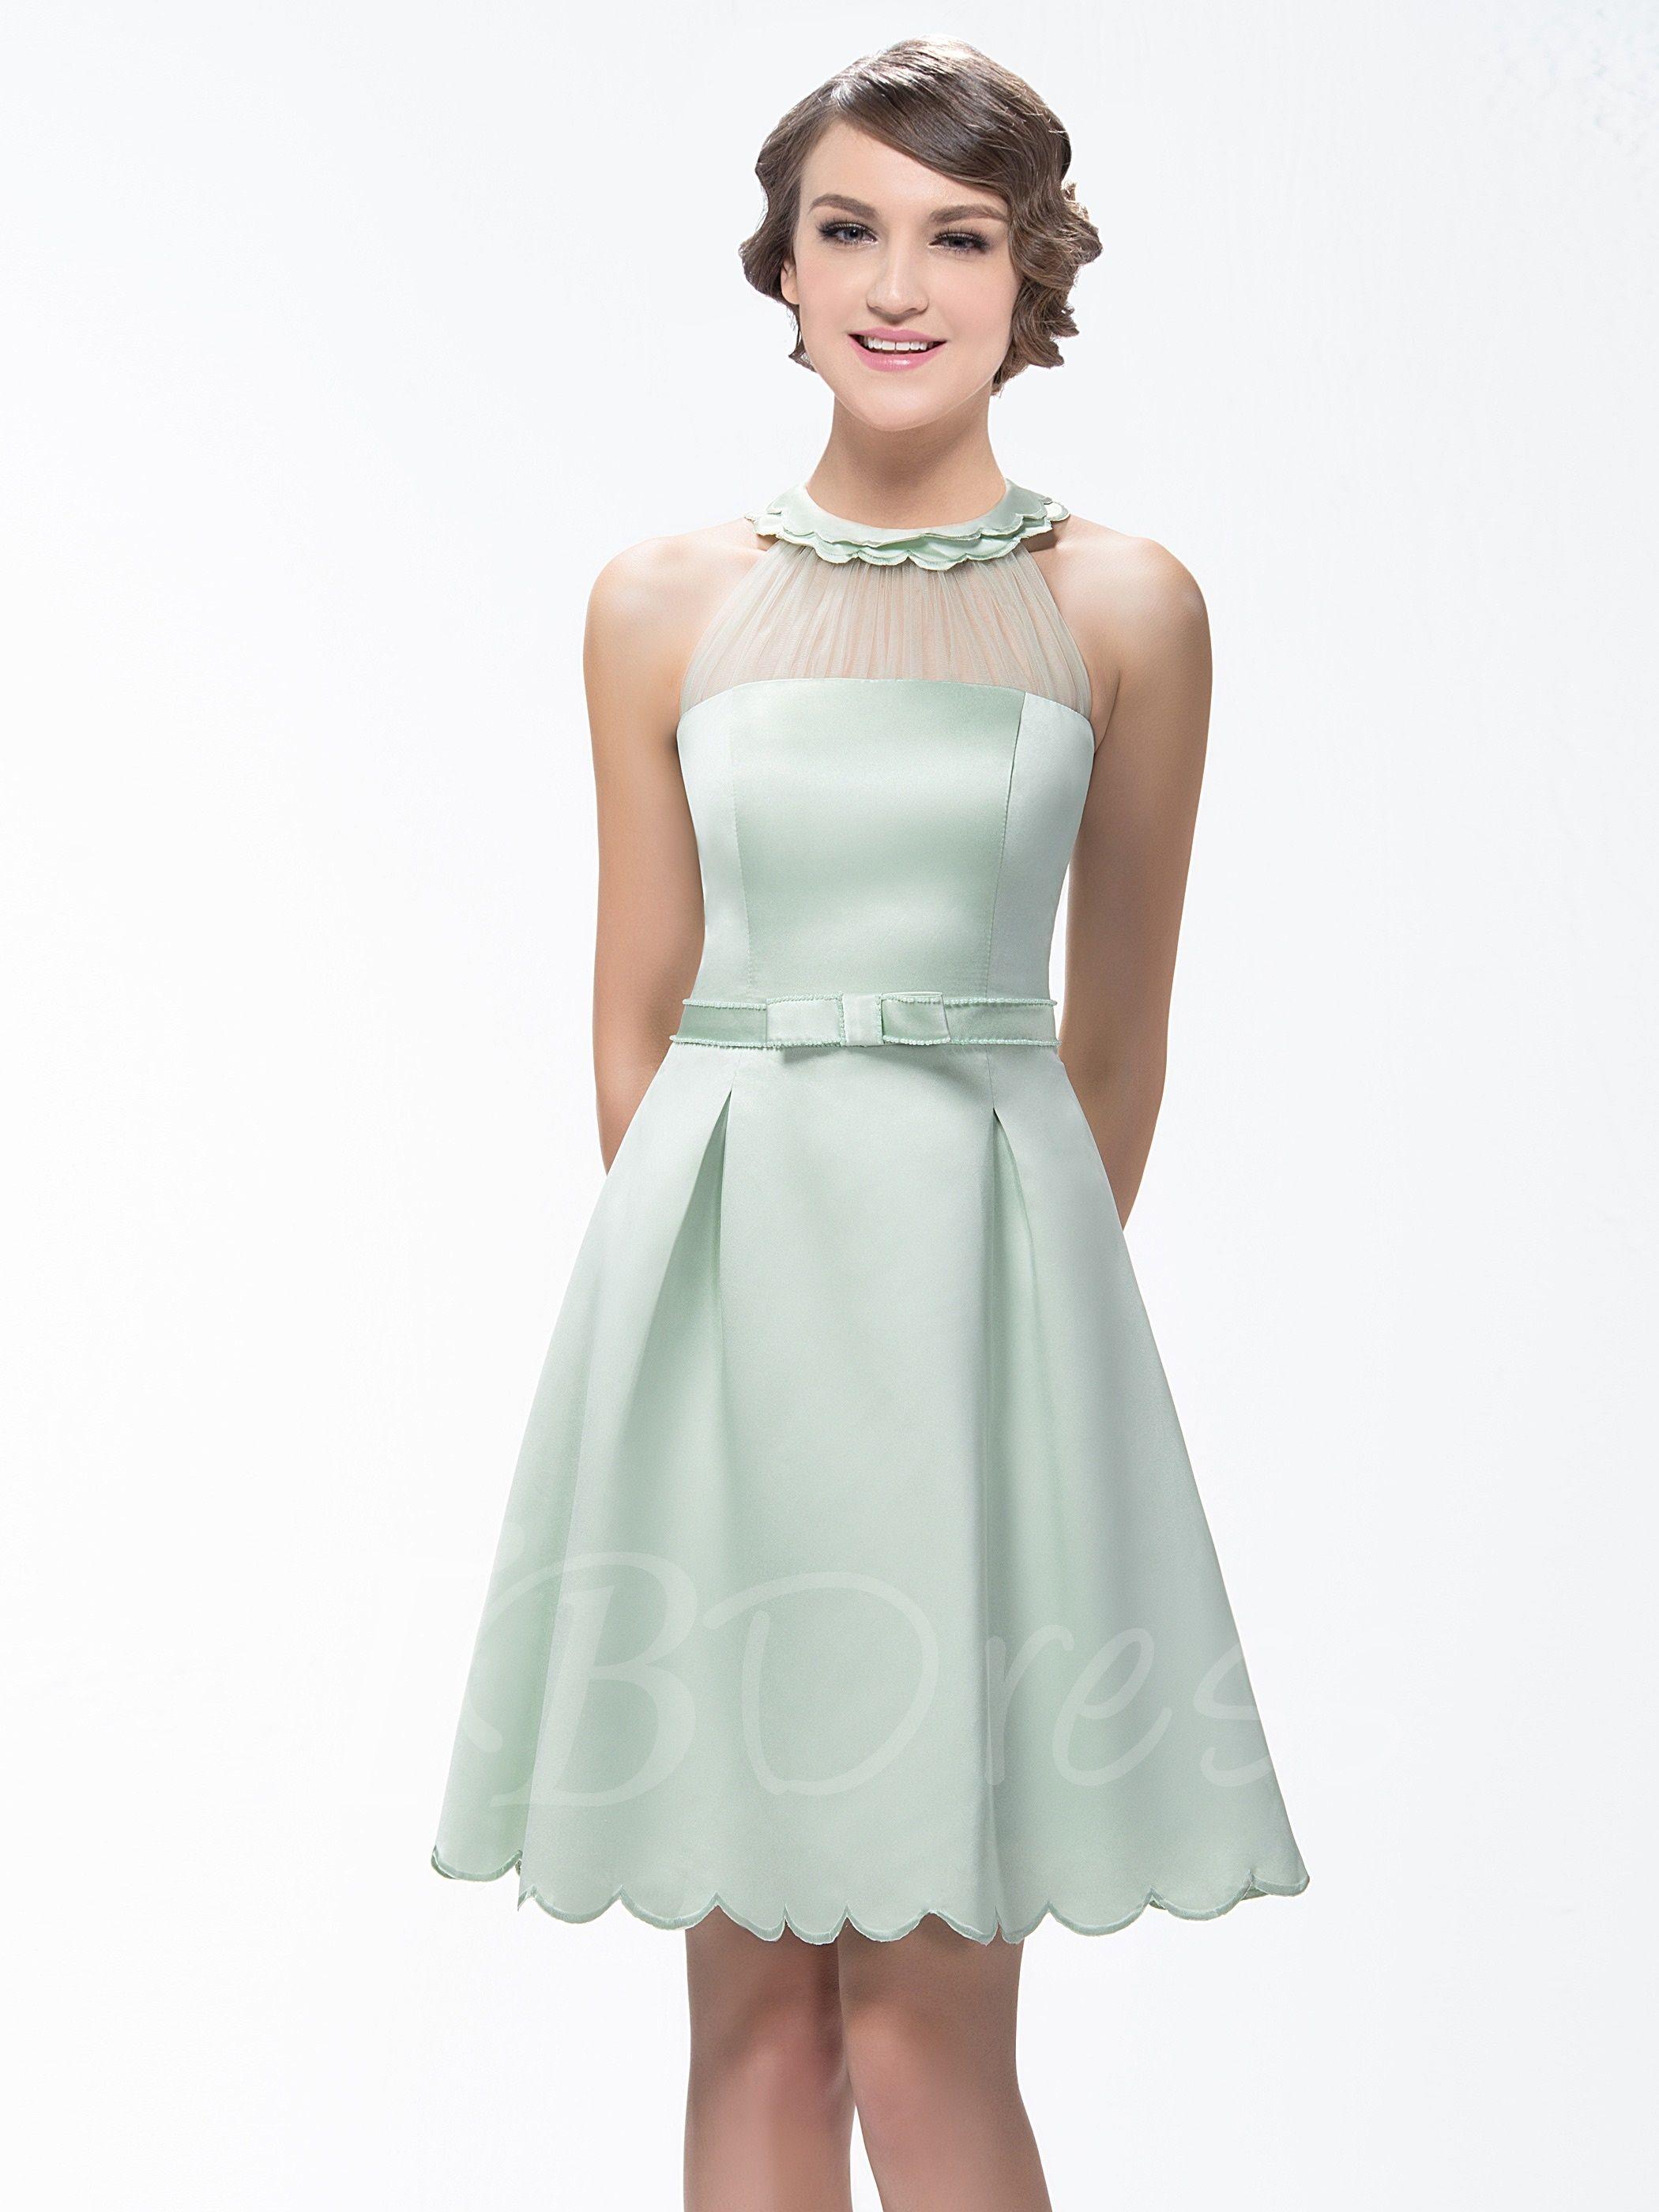 Aline shortmini zipperup scoop neck bridesmaid dress mr u mrs